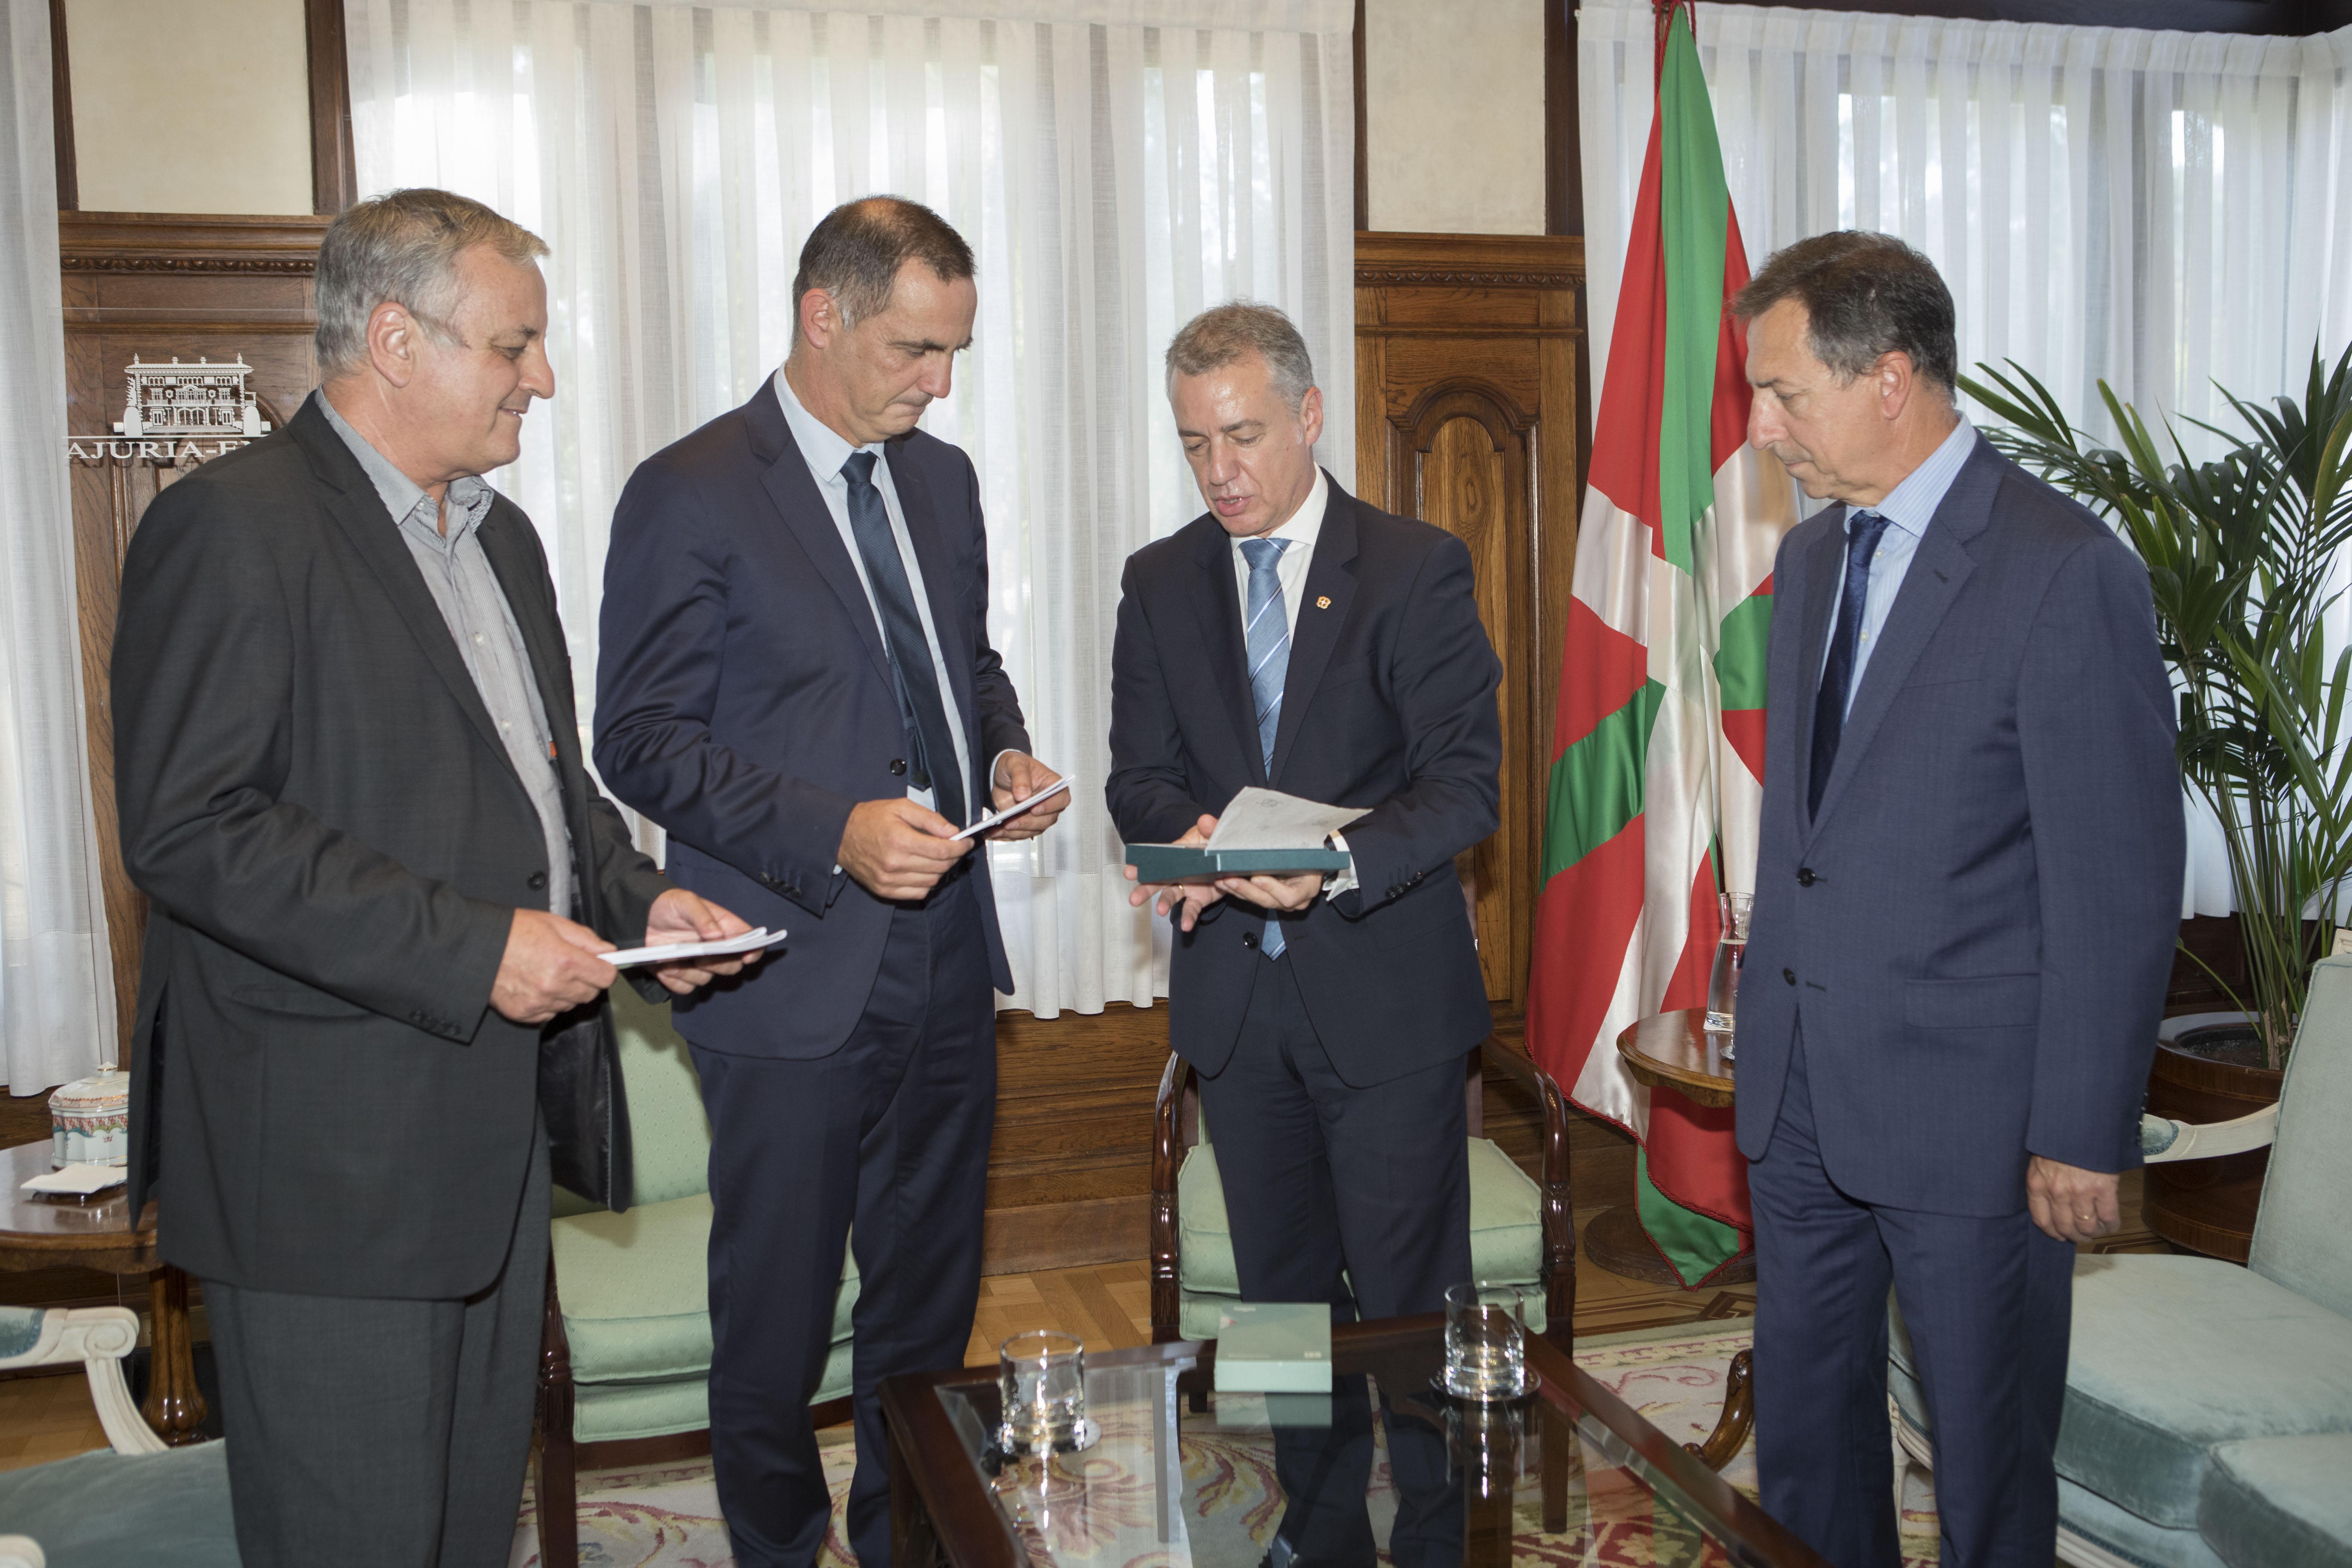 2019_09_28_lhk_presidente_Corcega_06.jpg